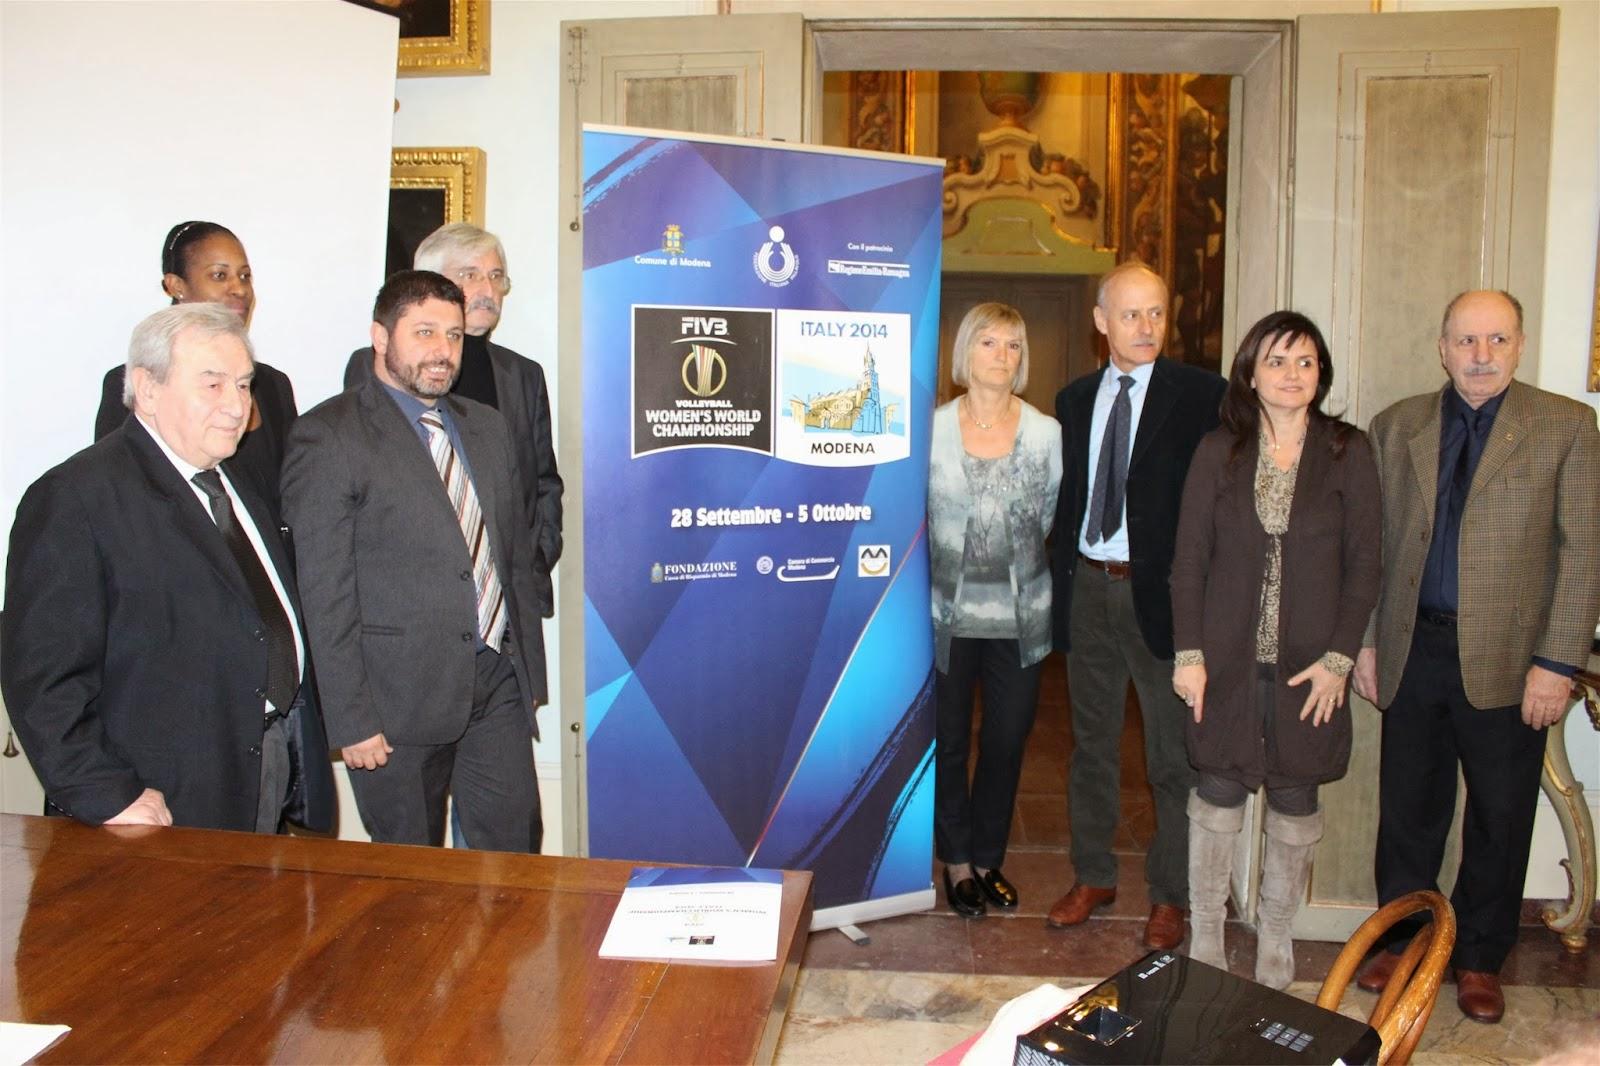 VOLLEY Italia 2014, Tai Aguero presidente a Modena